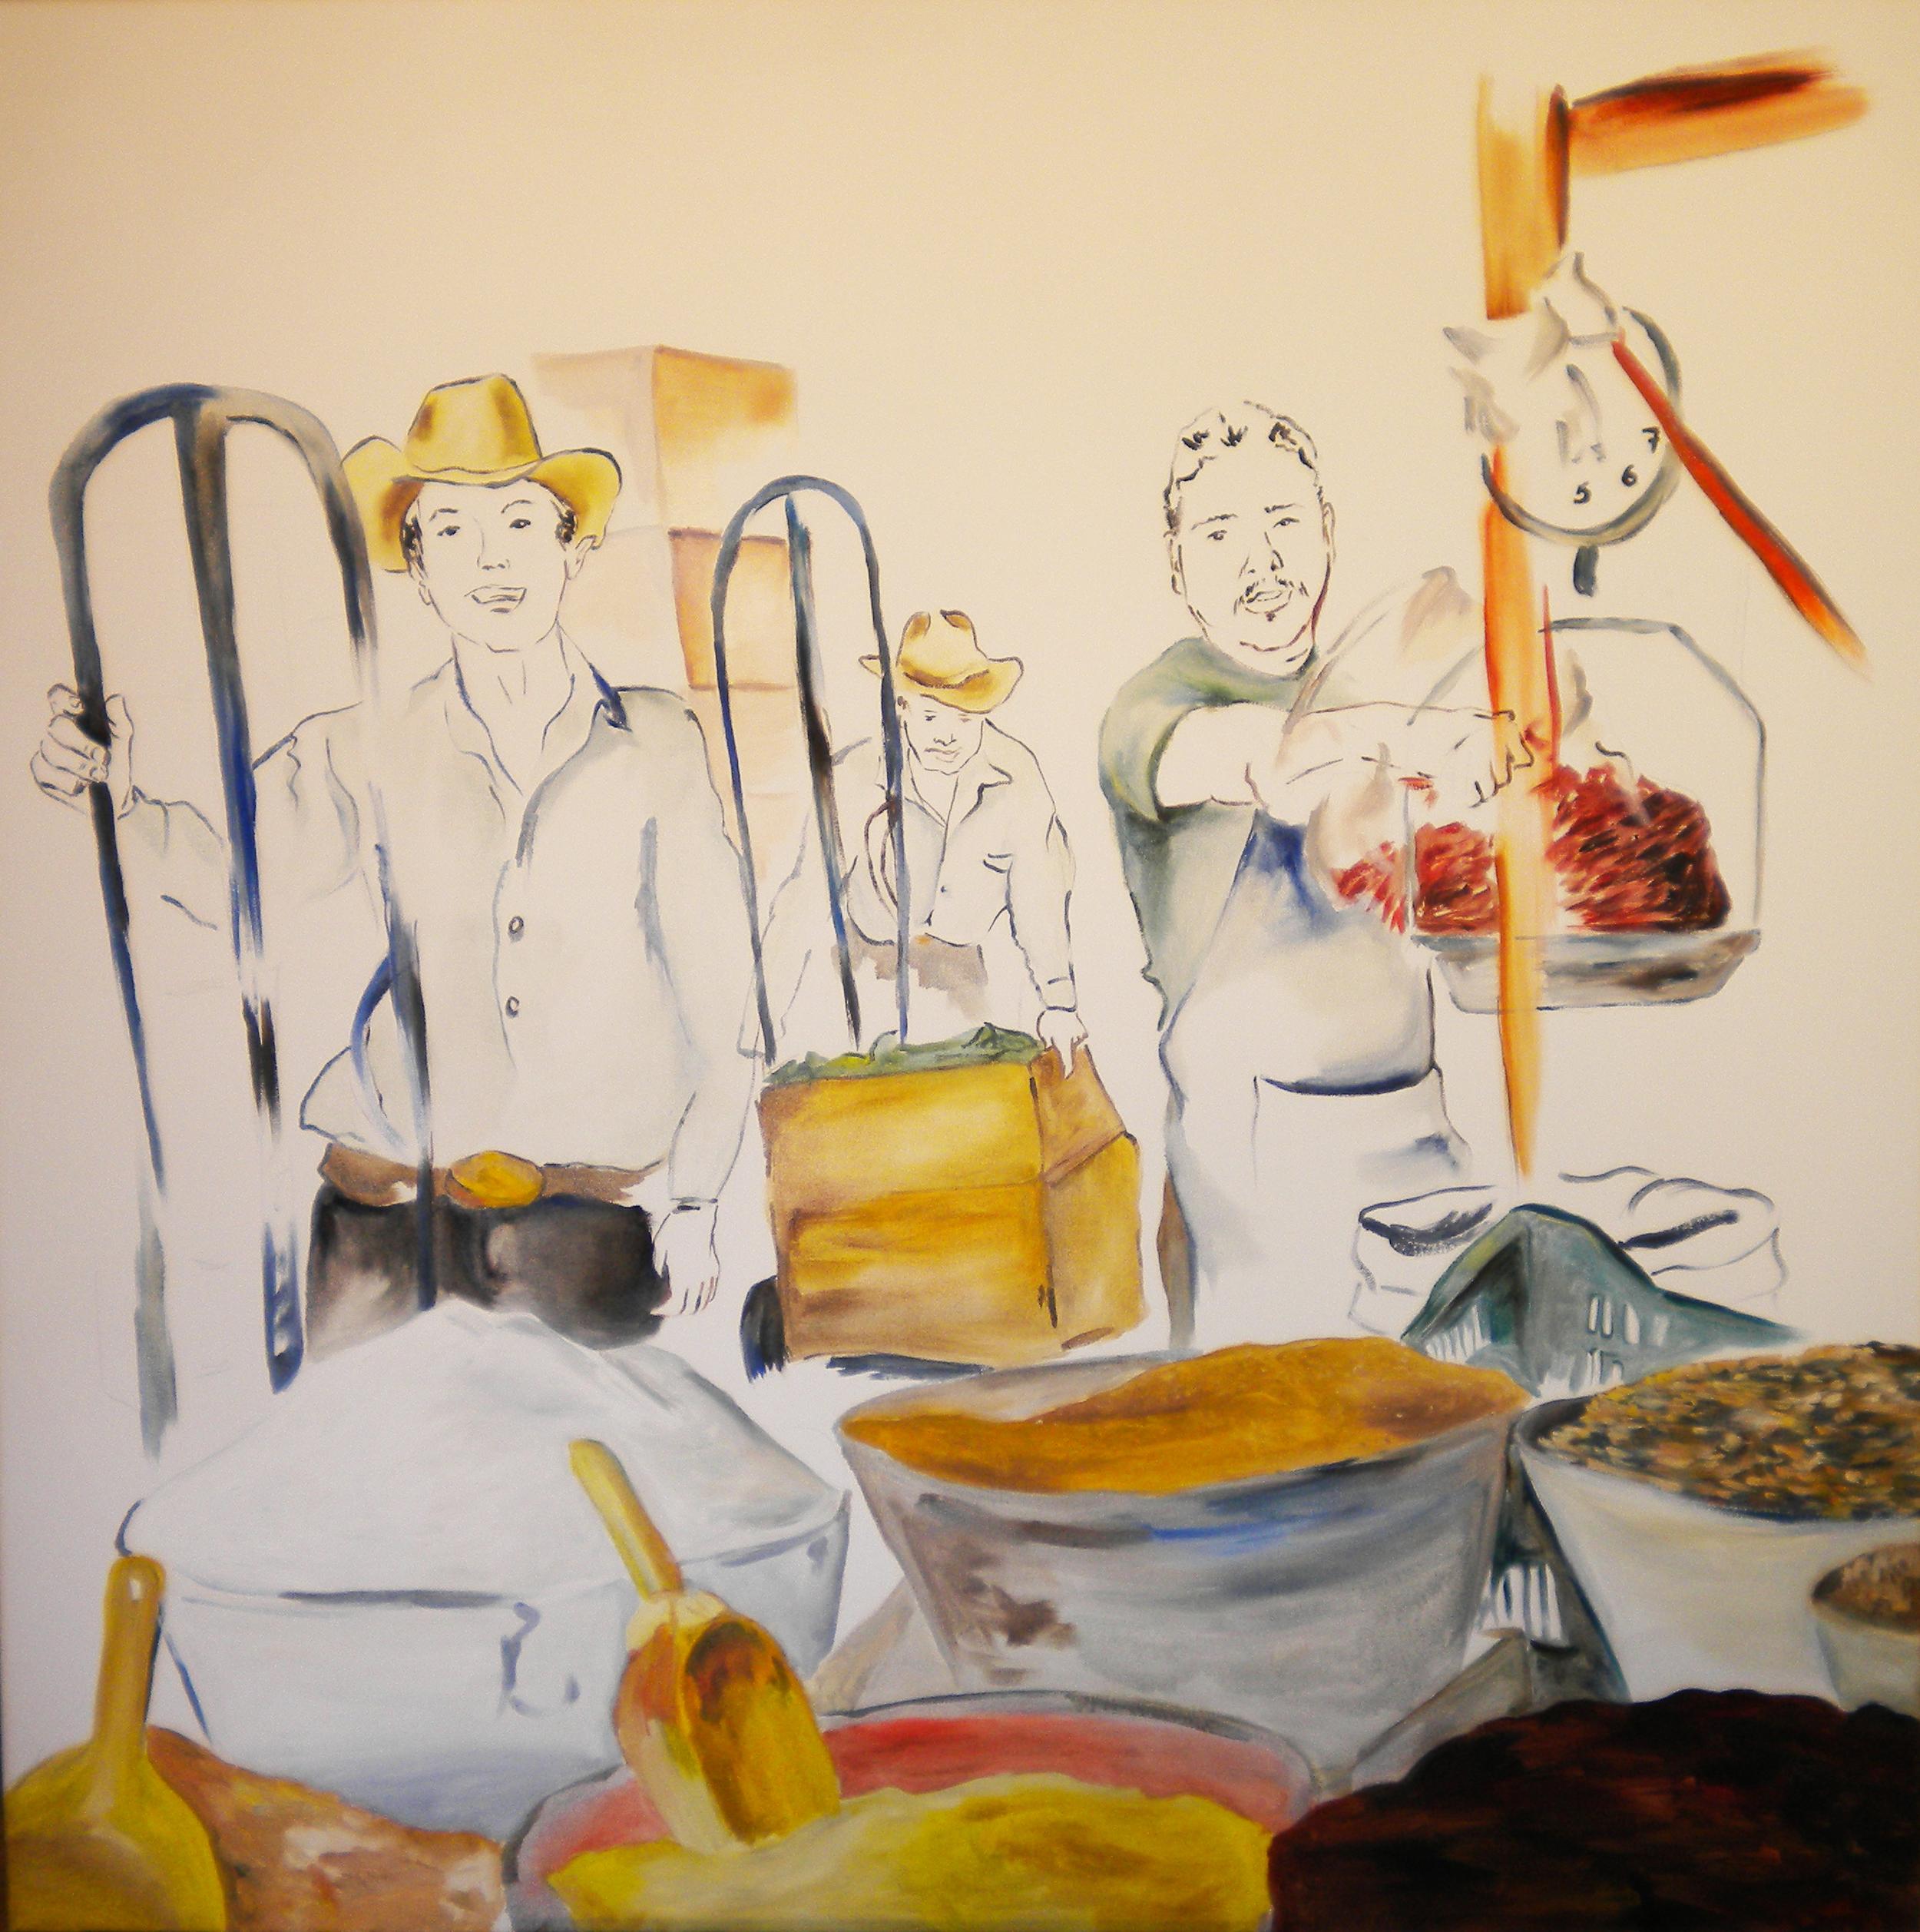 Especias  2010 oil on canvas 116 x 116 (private collection)